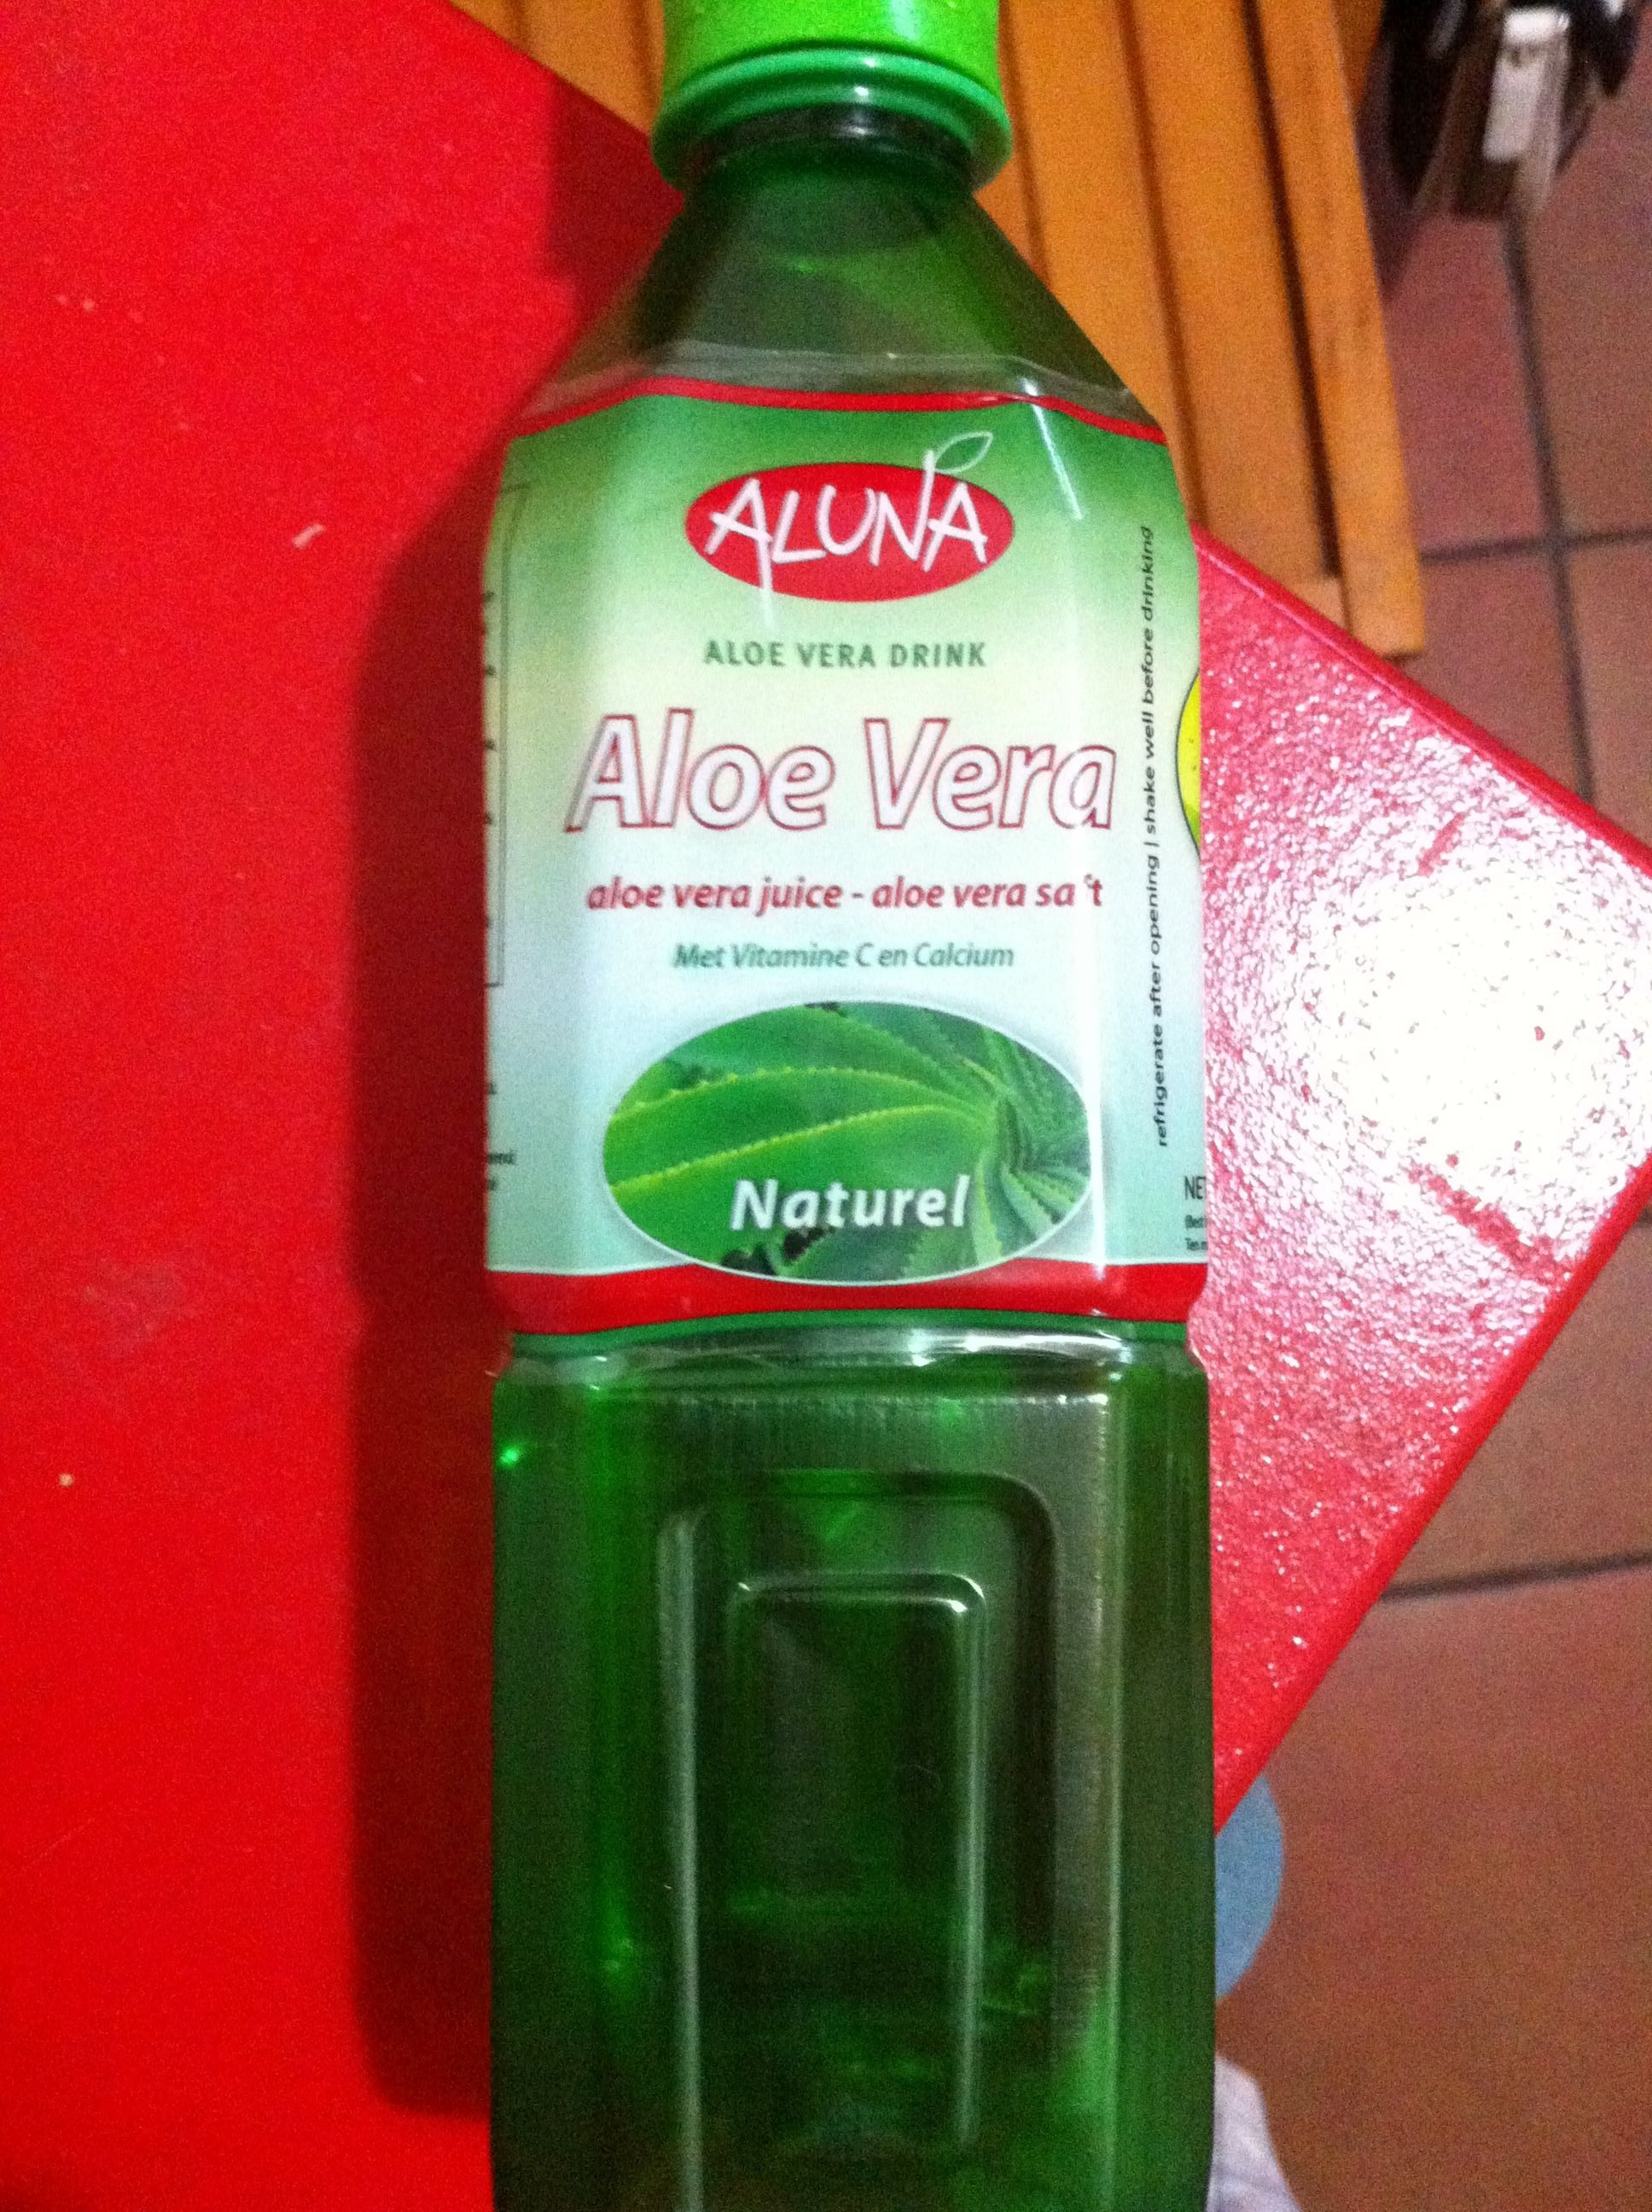 Aloe vera drink - Product